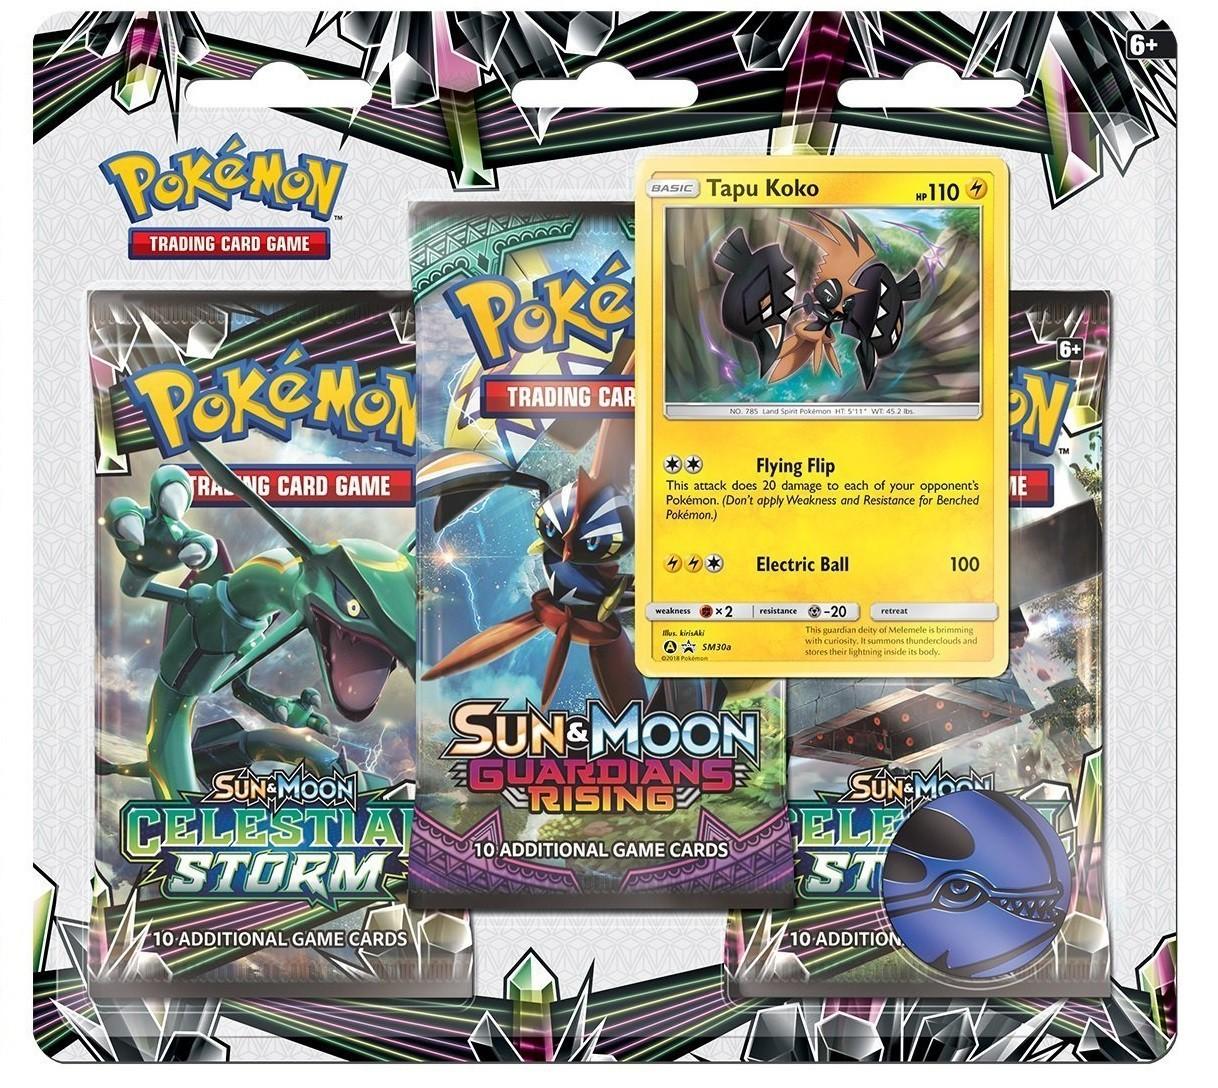 Pokemon TCG: Sun & Moon 7 Celestial Storm - 3 Pack Blister (Tapu Koko)